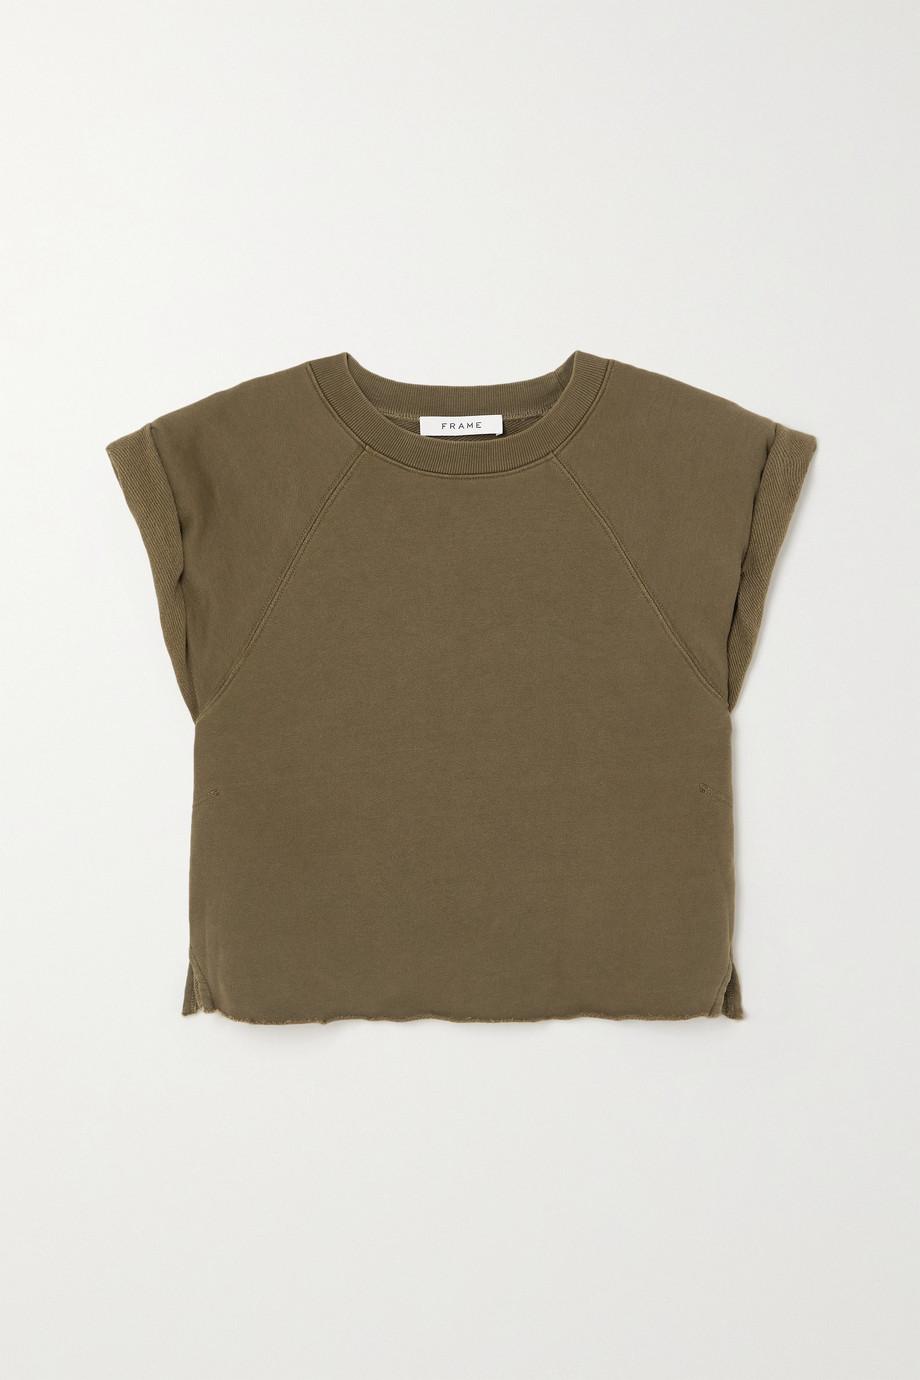 FRAME Organic cotton-terry top